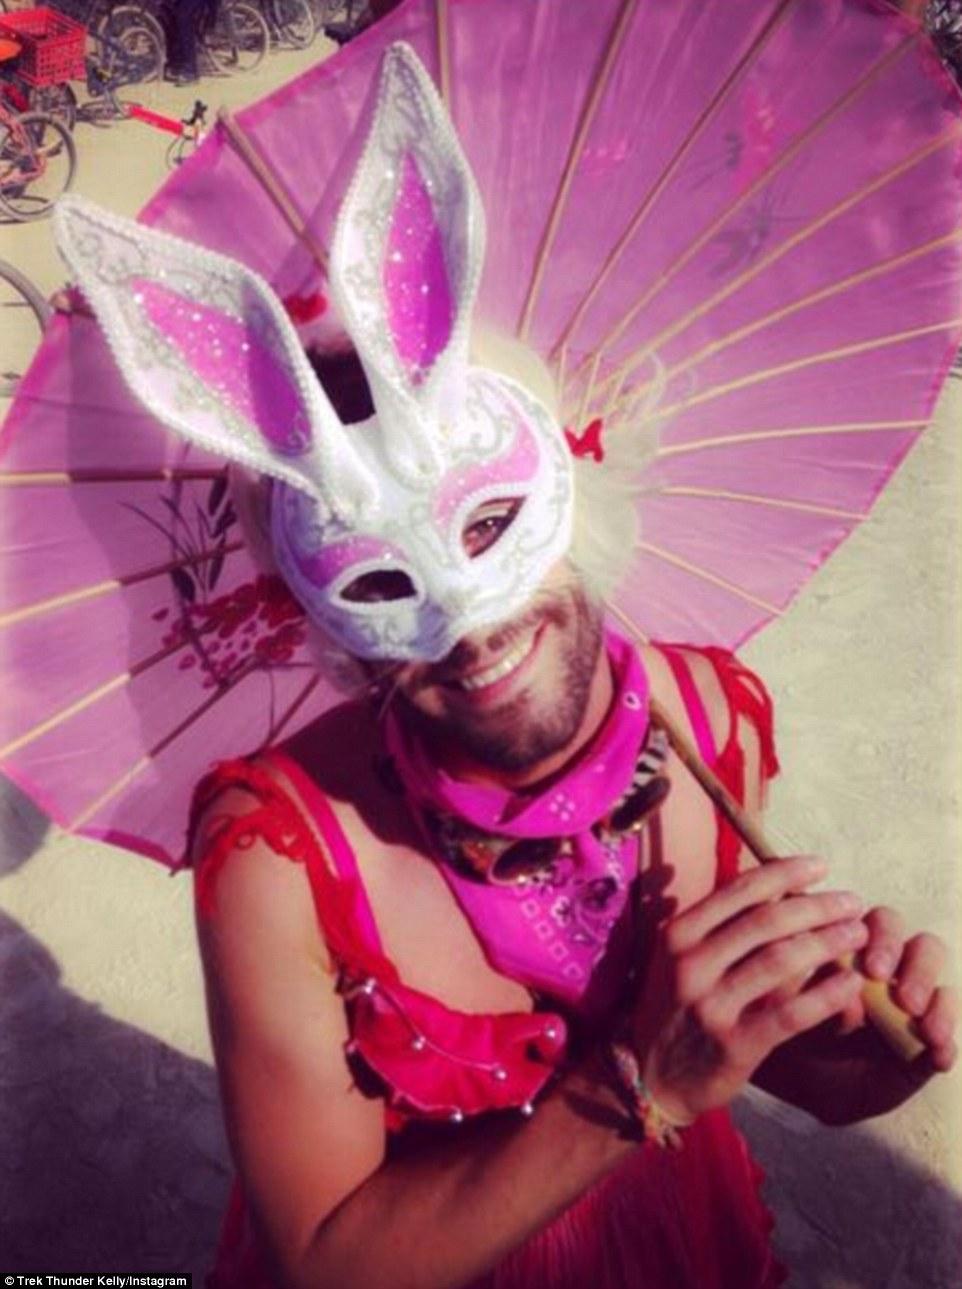 Burning Man Festival: Τα σύγχρονα Σόδομα και Γόμορα - Οργια μέσα στην έρημο [εικόνες & βίντεο] | iefimerida.gr 3